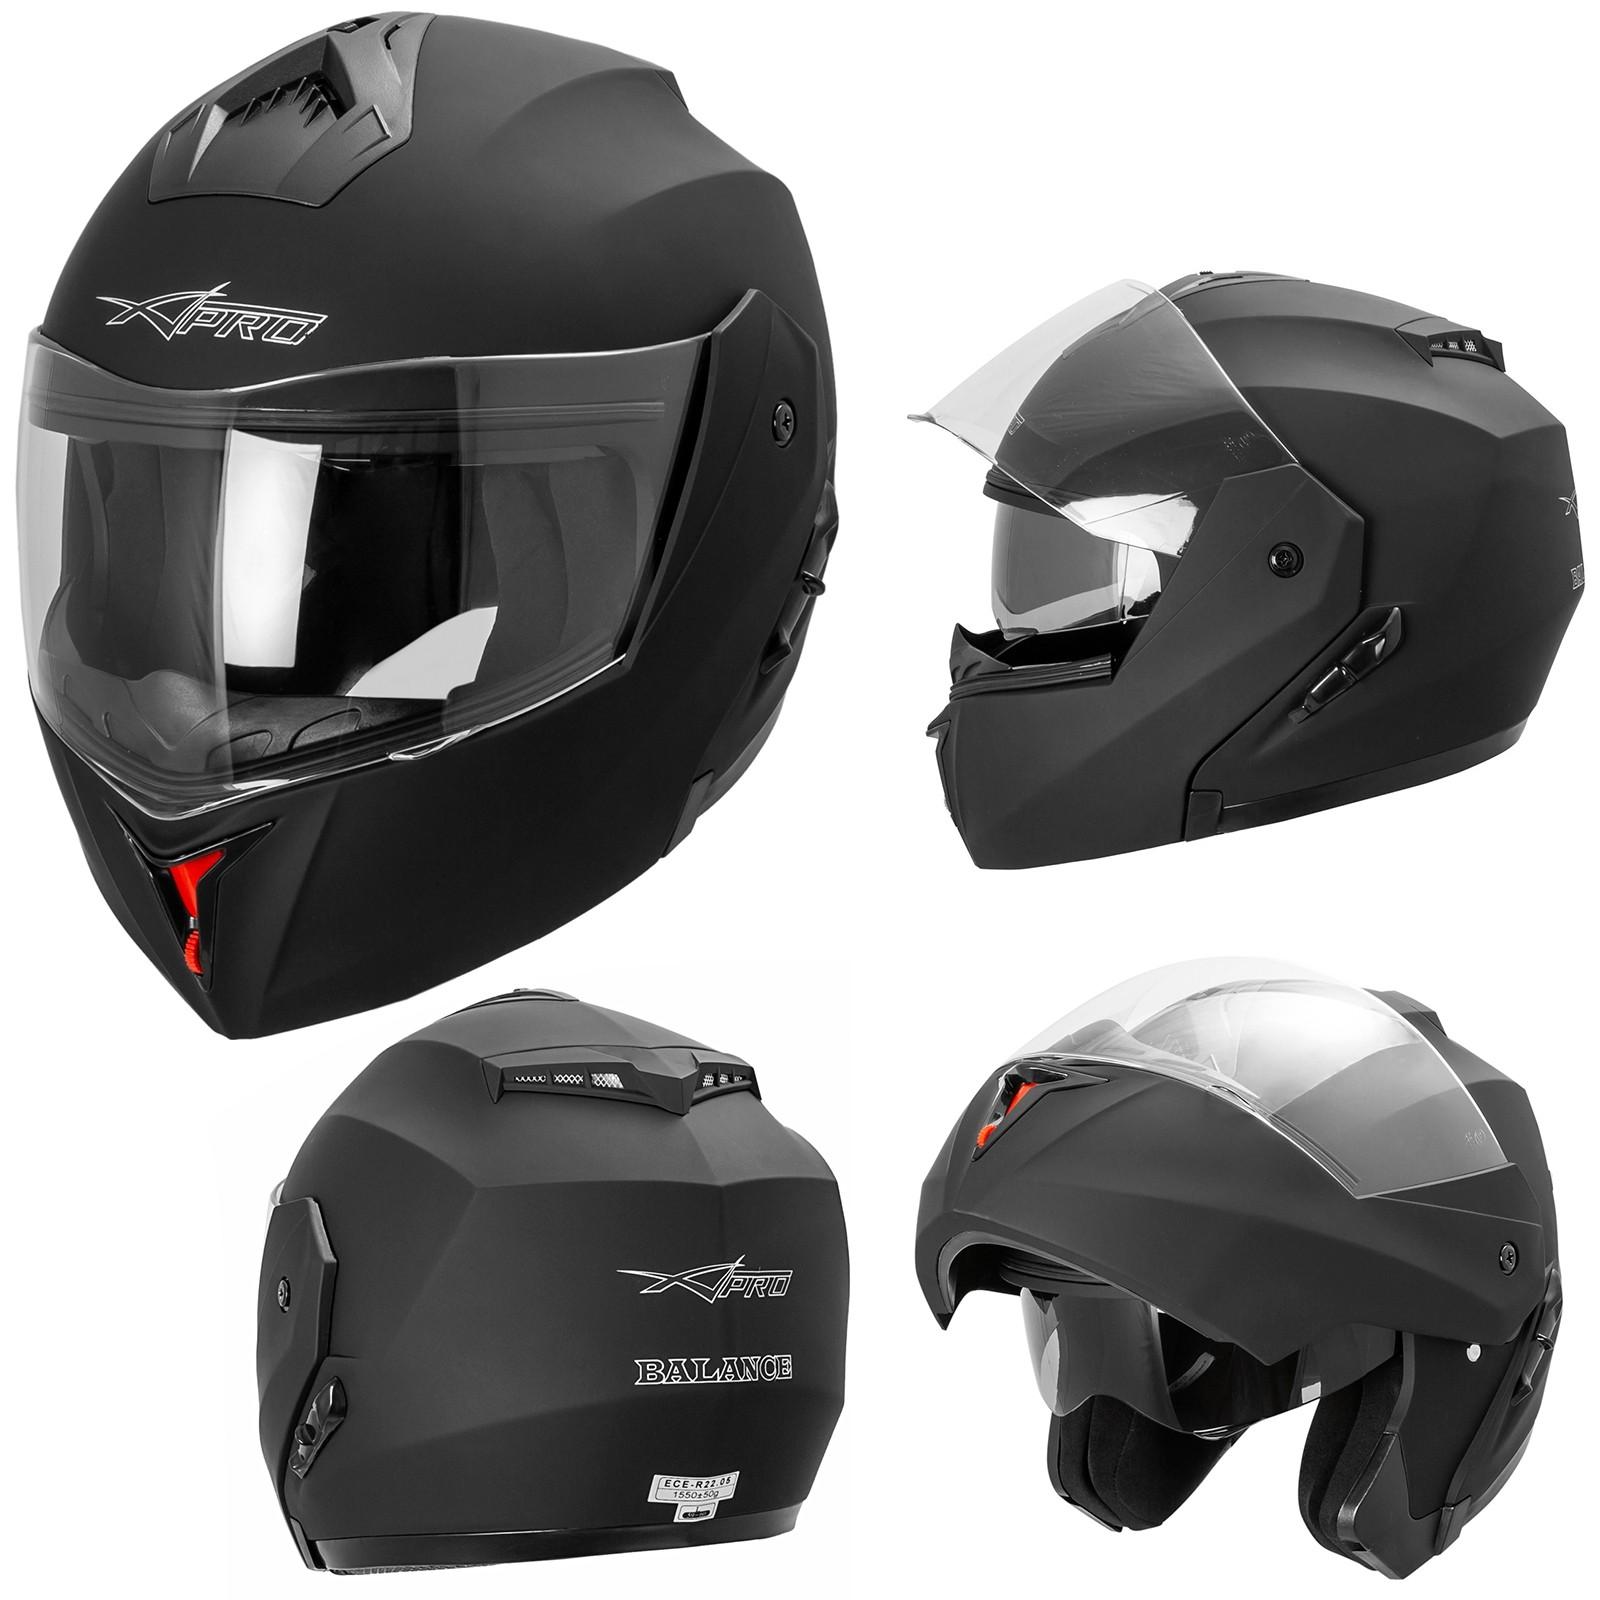 Balance-Casco-Helmet-Motorcycle-Nero-Opaco-Matt-Black-A-Pro-Sonic-Moto-Set